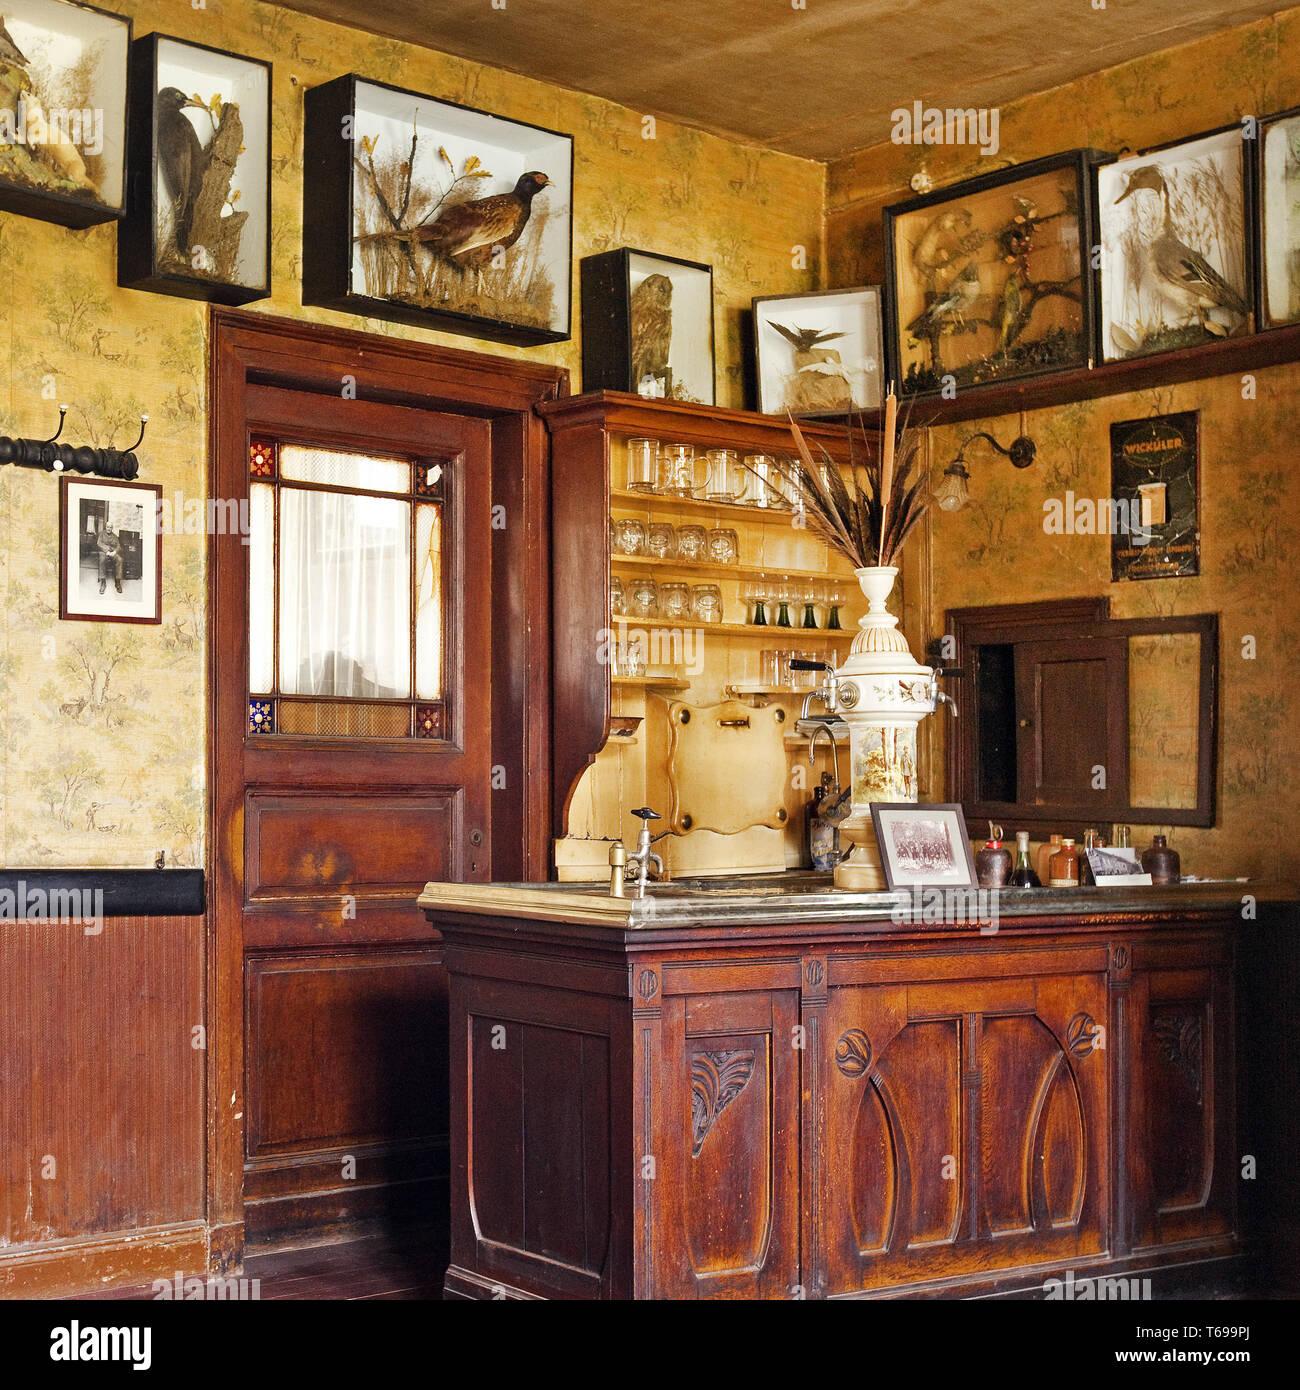 historic restaurant at open-air museum, Lindlar, Bergisches Land, North Rhine-Westphalia, Germany - Stock Image